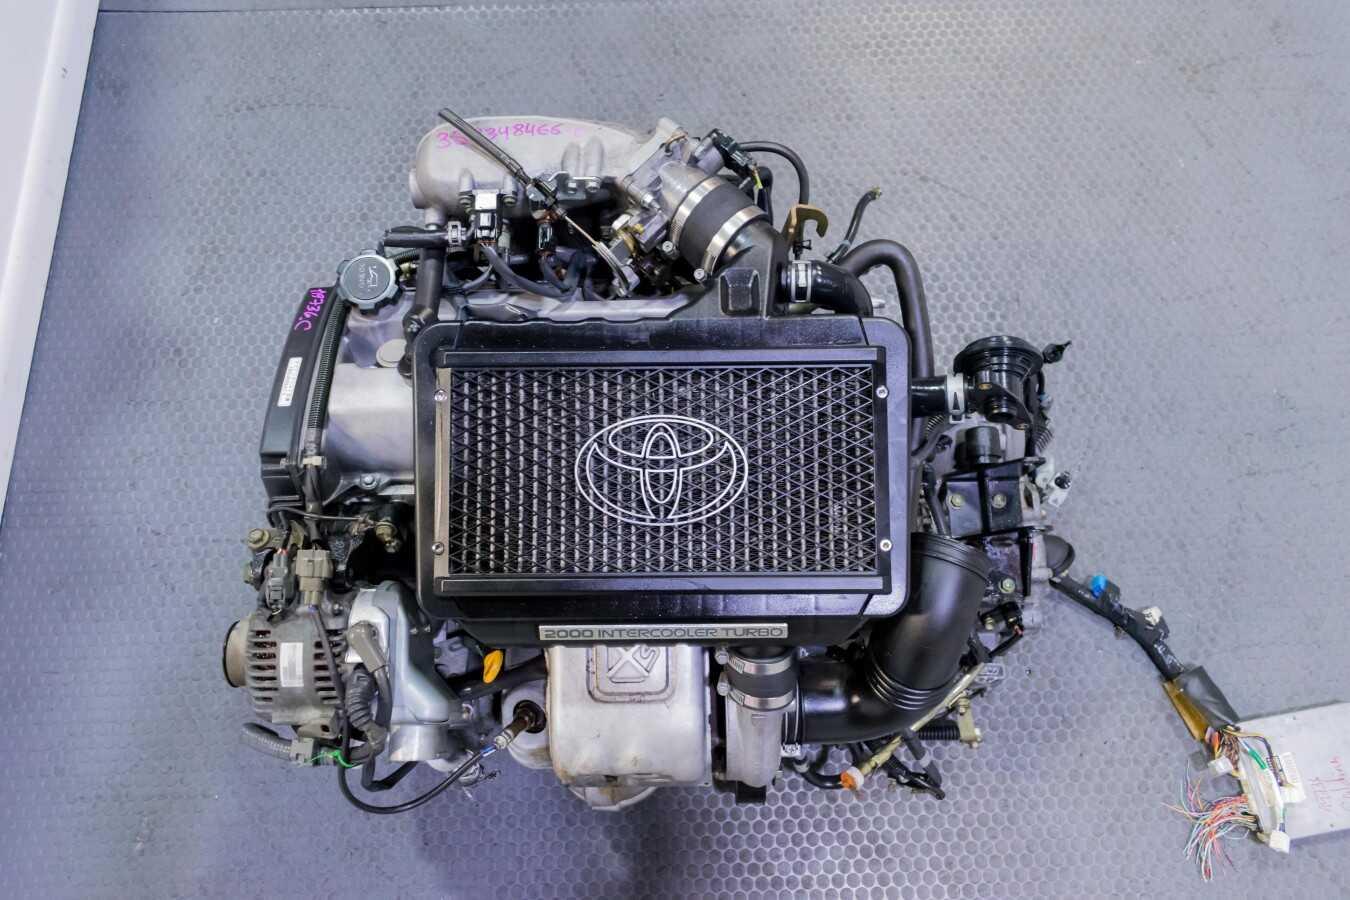 JDM Used 3S-GTE Gen 4 Turbocharged Toyota Caldina Engine for Celica MR2  Corolla swap etc